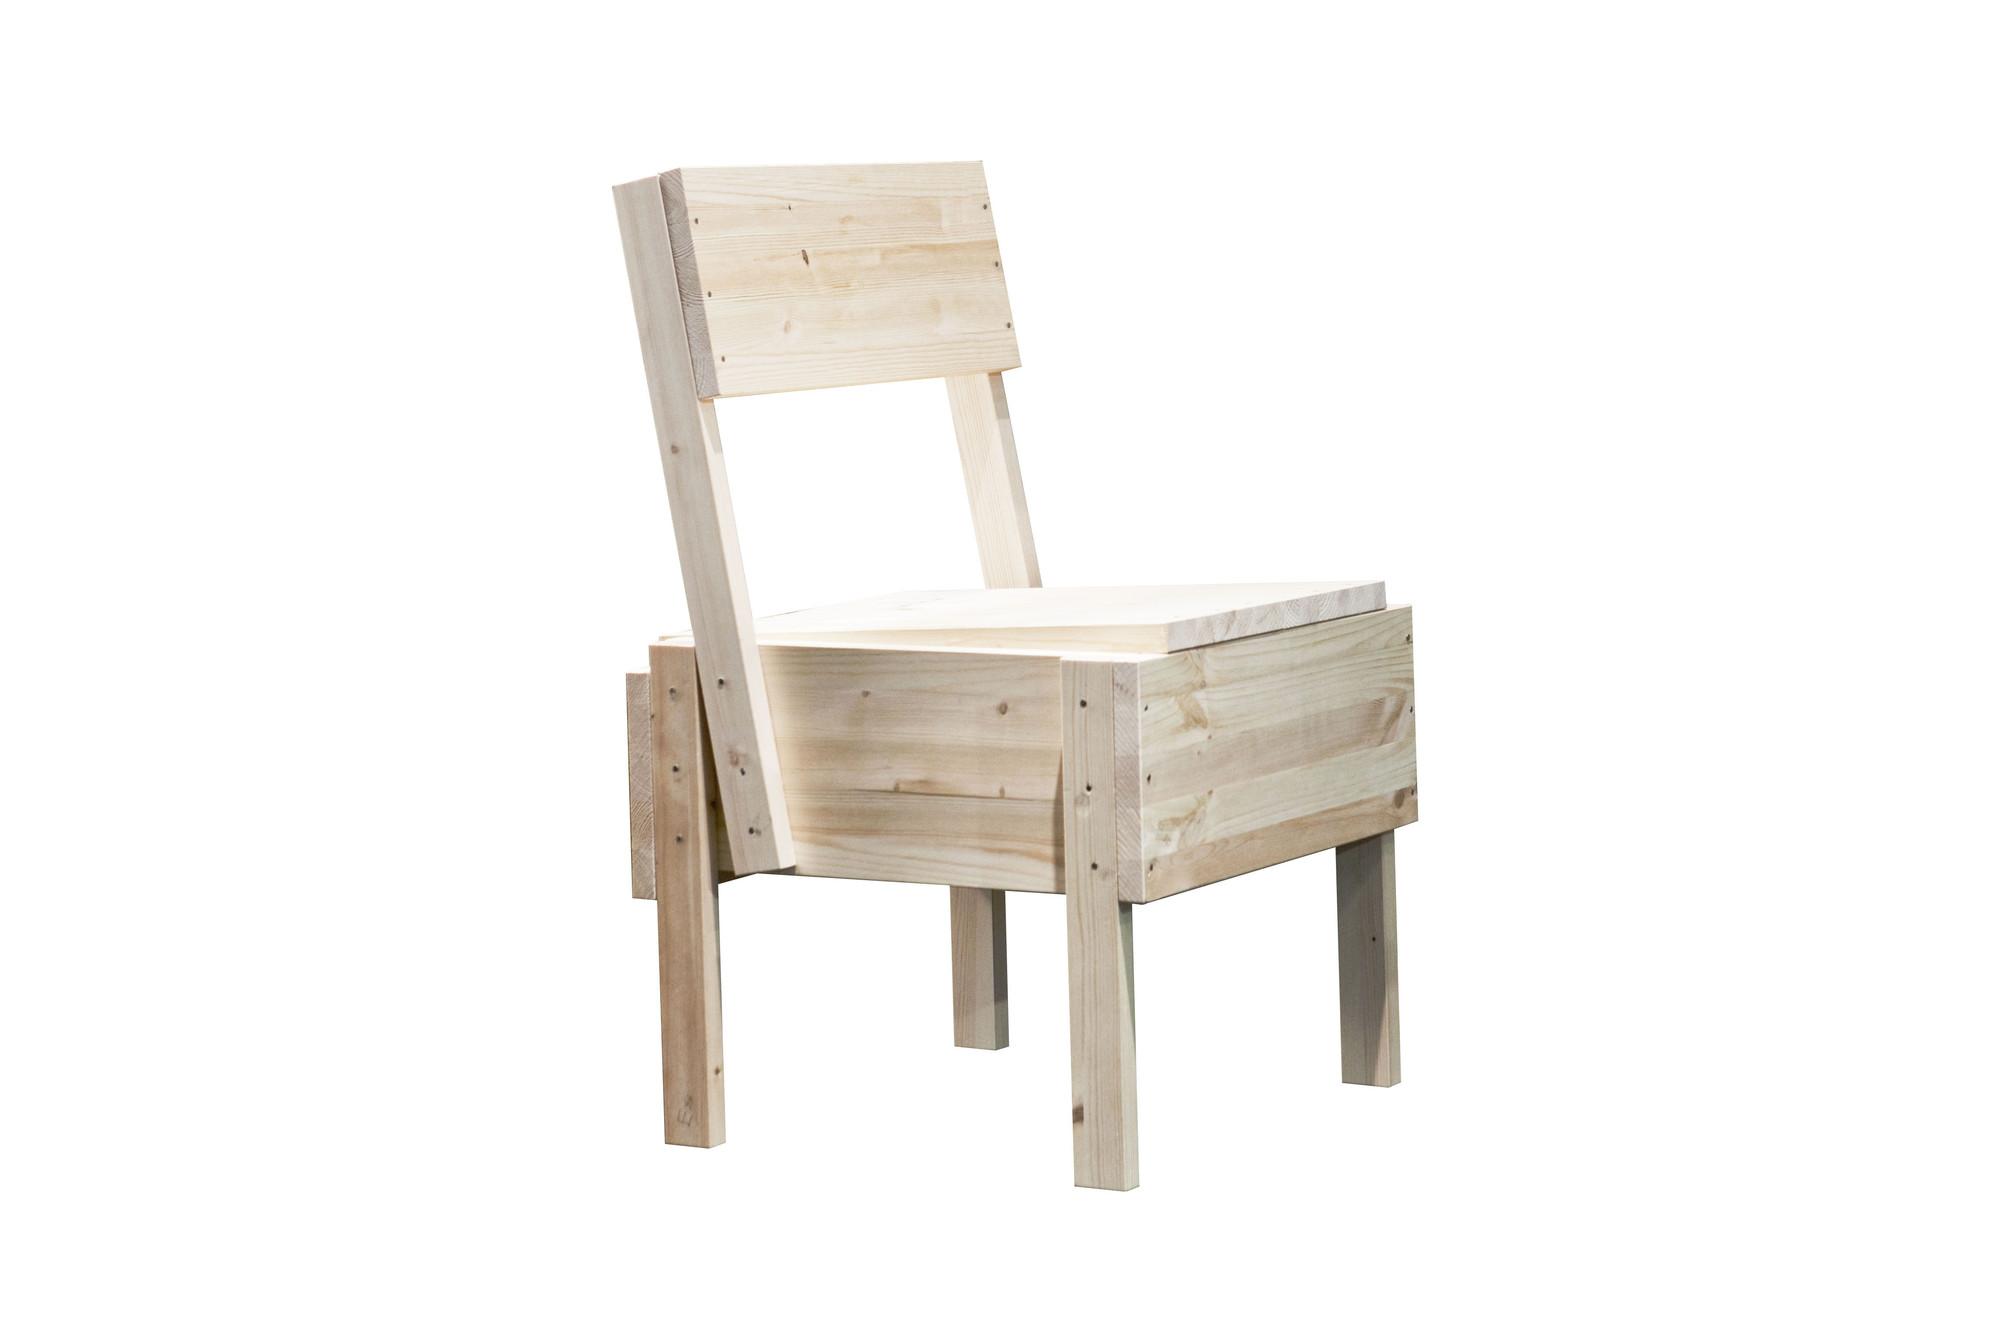 silla sedia 1 enzo mari plataforma arquitectura